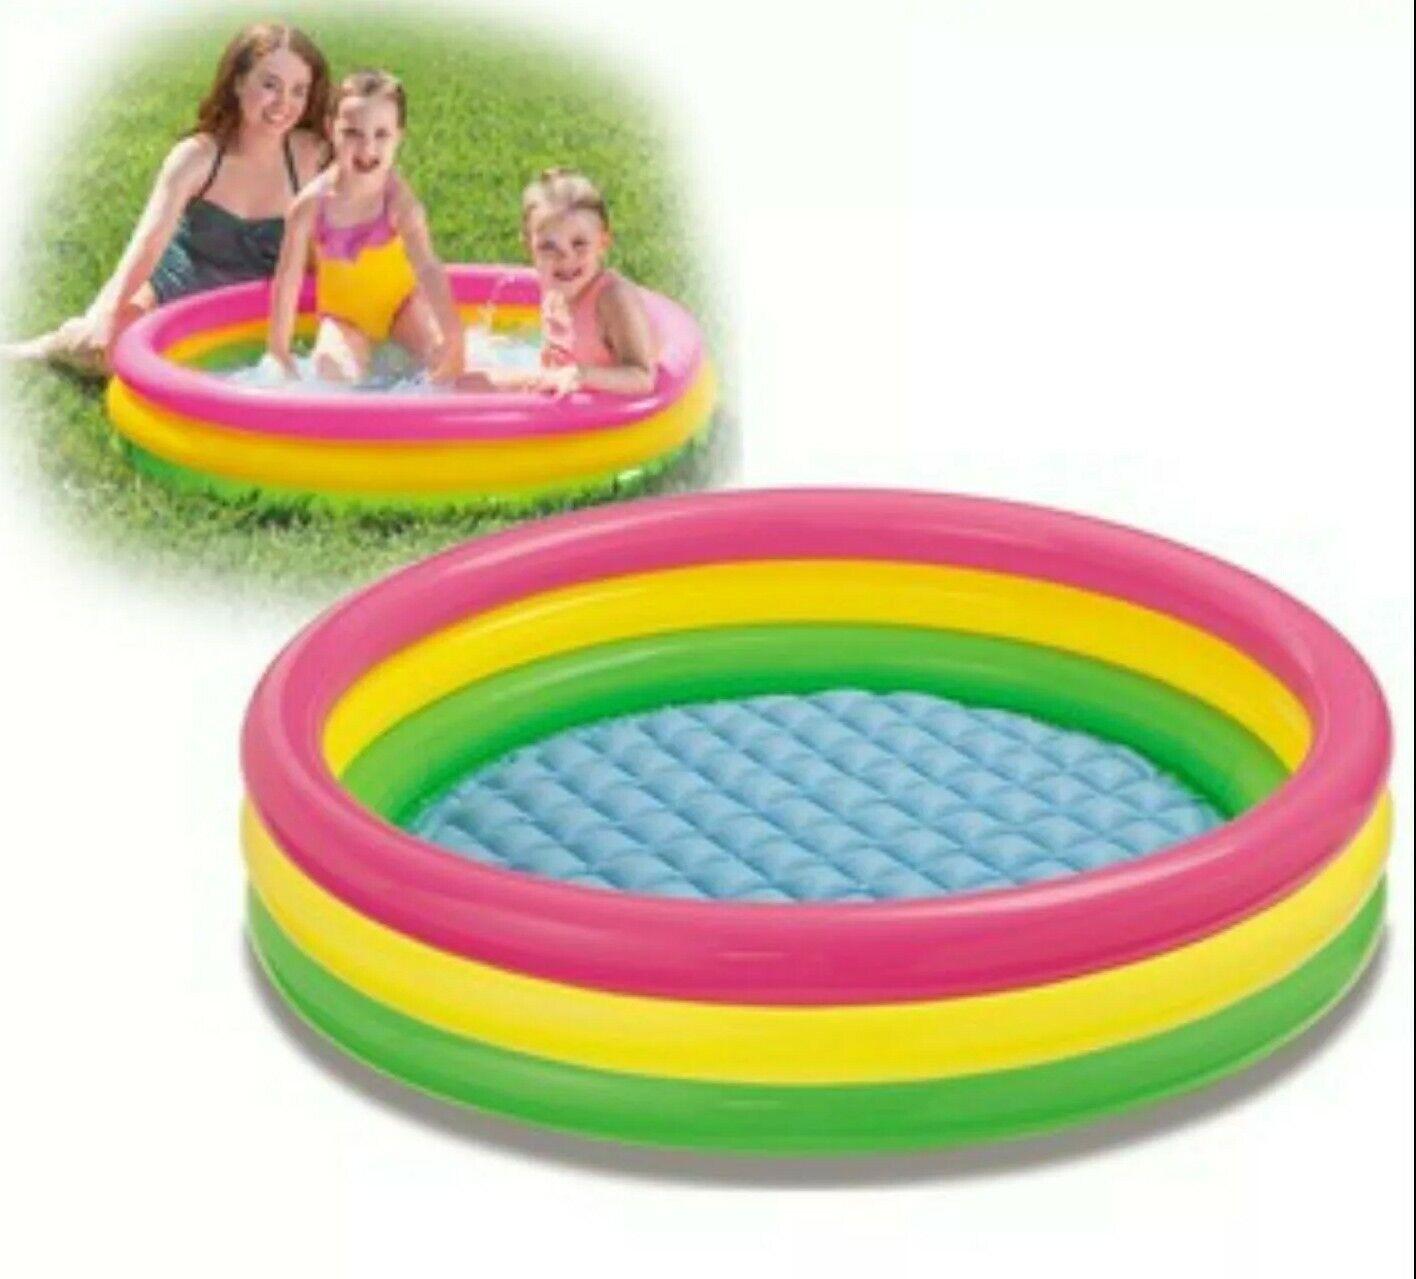 Inflatable Rainbow Sunset Paddling Pool Kids Swimming Bath Tub Water Activity